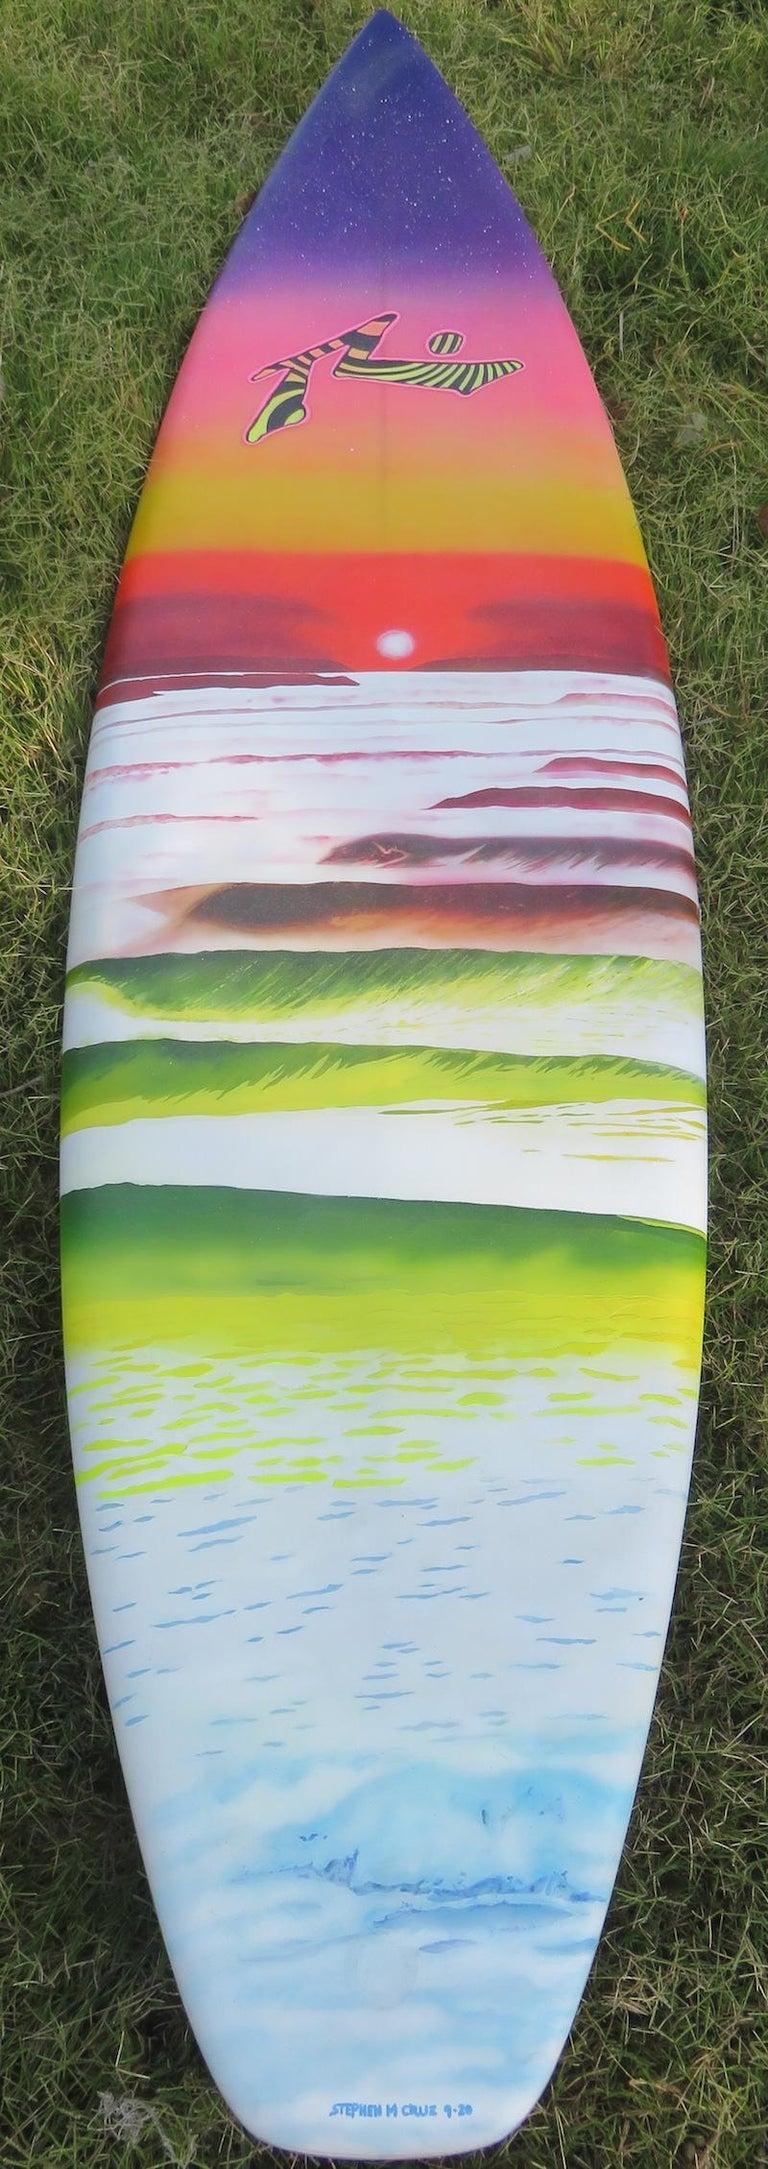 "1980s Vintage Rusty Preisendorfer Surfboard ""Surf on Planet X"" by Stephen Cruz 4"